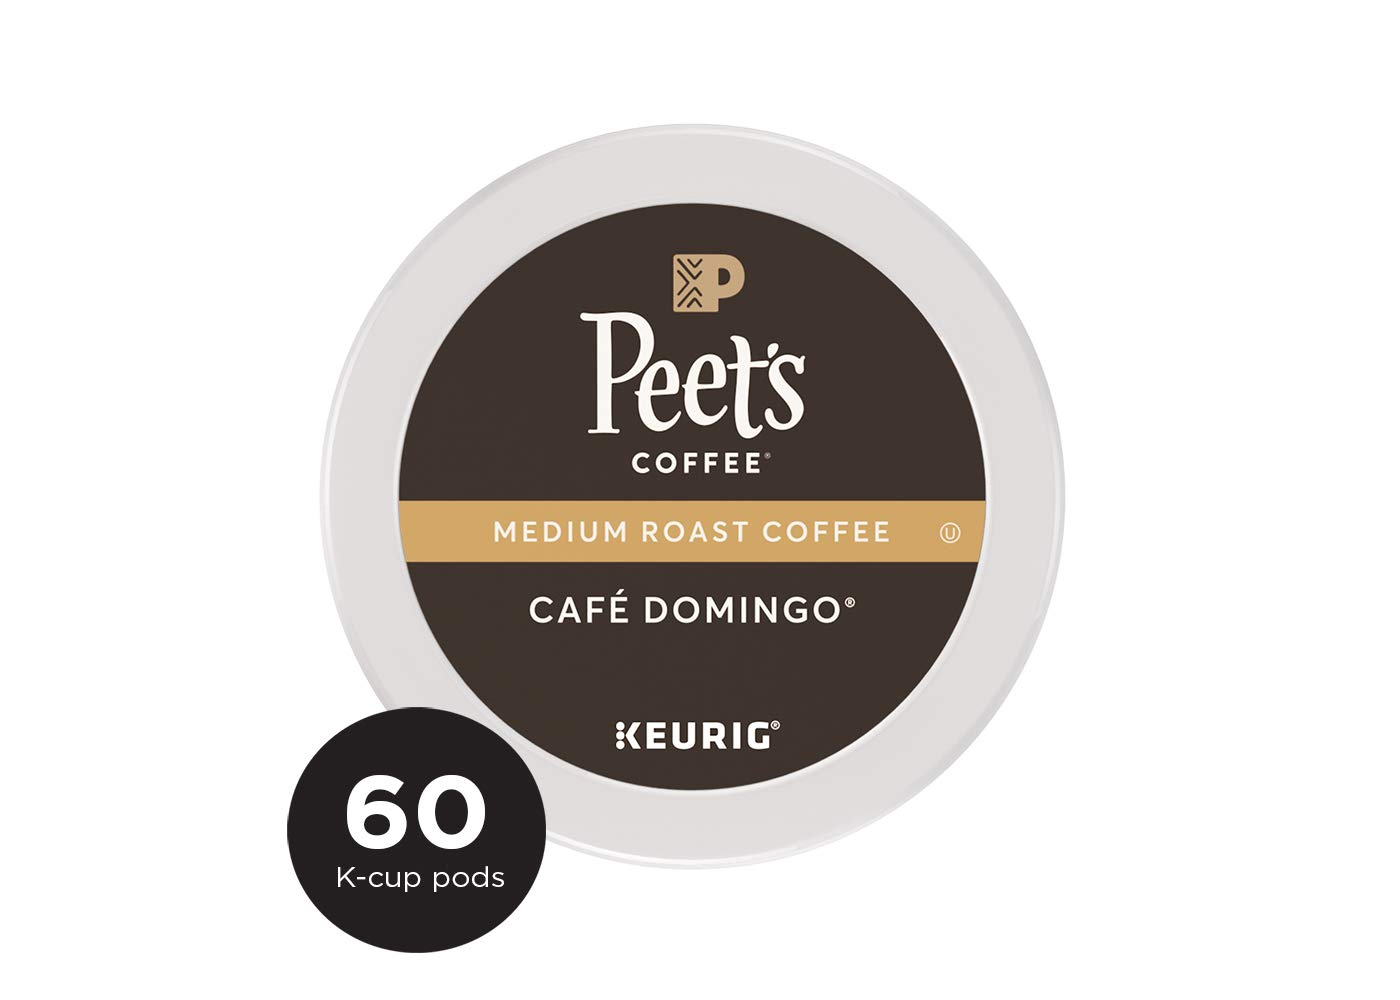 Peet's Coffee Café Domingo, Medium Roast, 60 Count Single Serve K-Cup Coffee Pods for Keurig Coffee Maker by Peet's Coffee